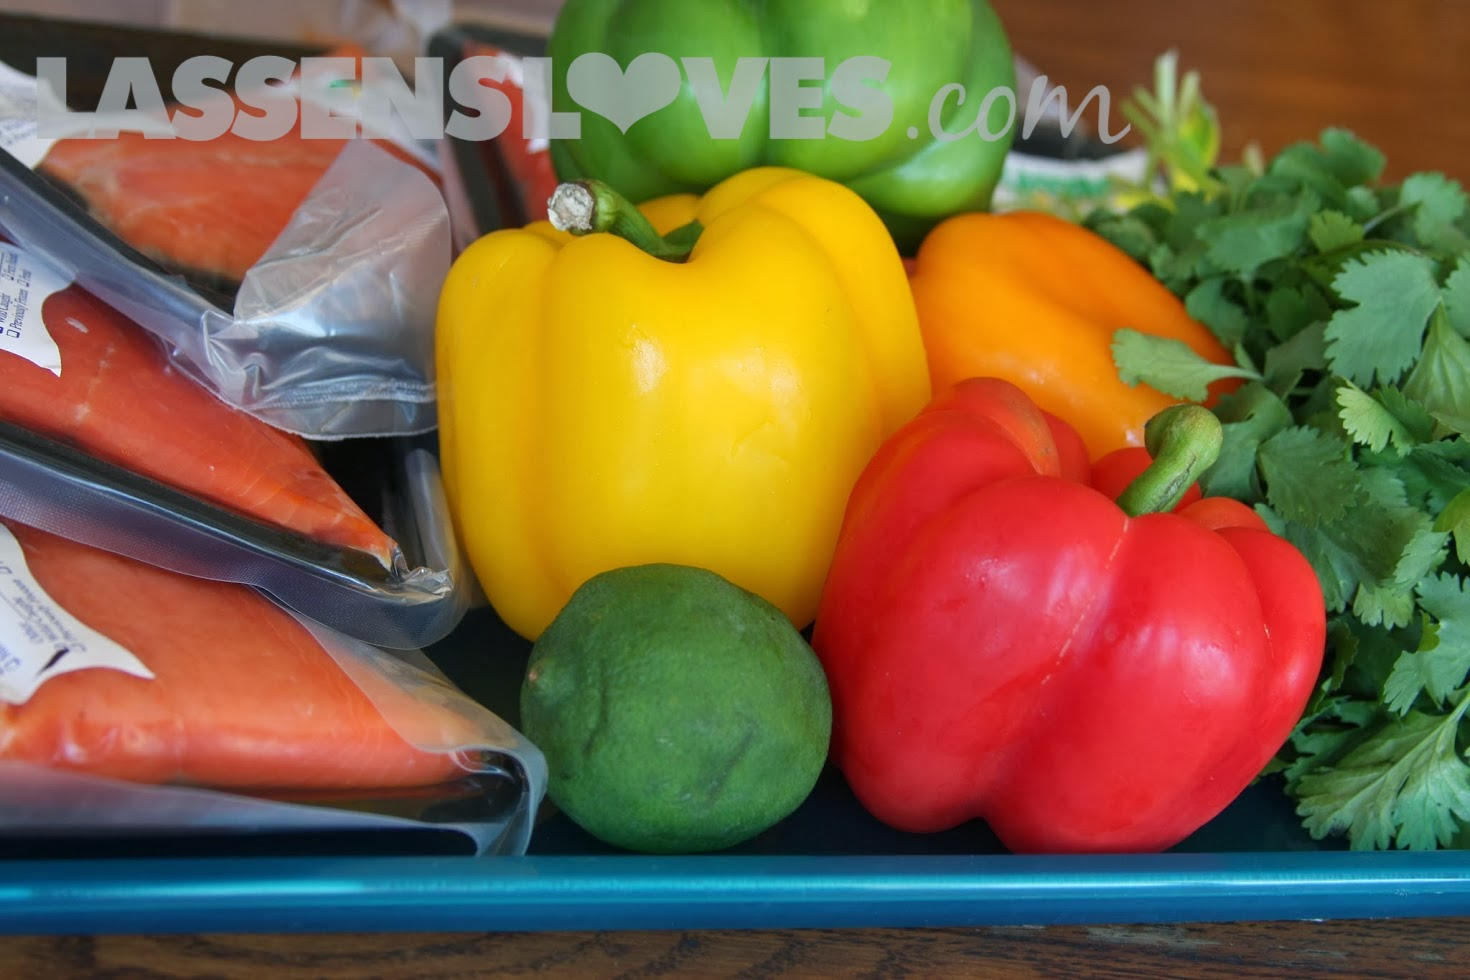 lassensloves.com, Lassen's, Lassens, Salmon+Recipe, Salmon+Peppers+Recipe